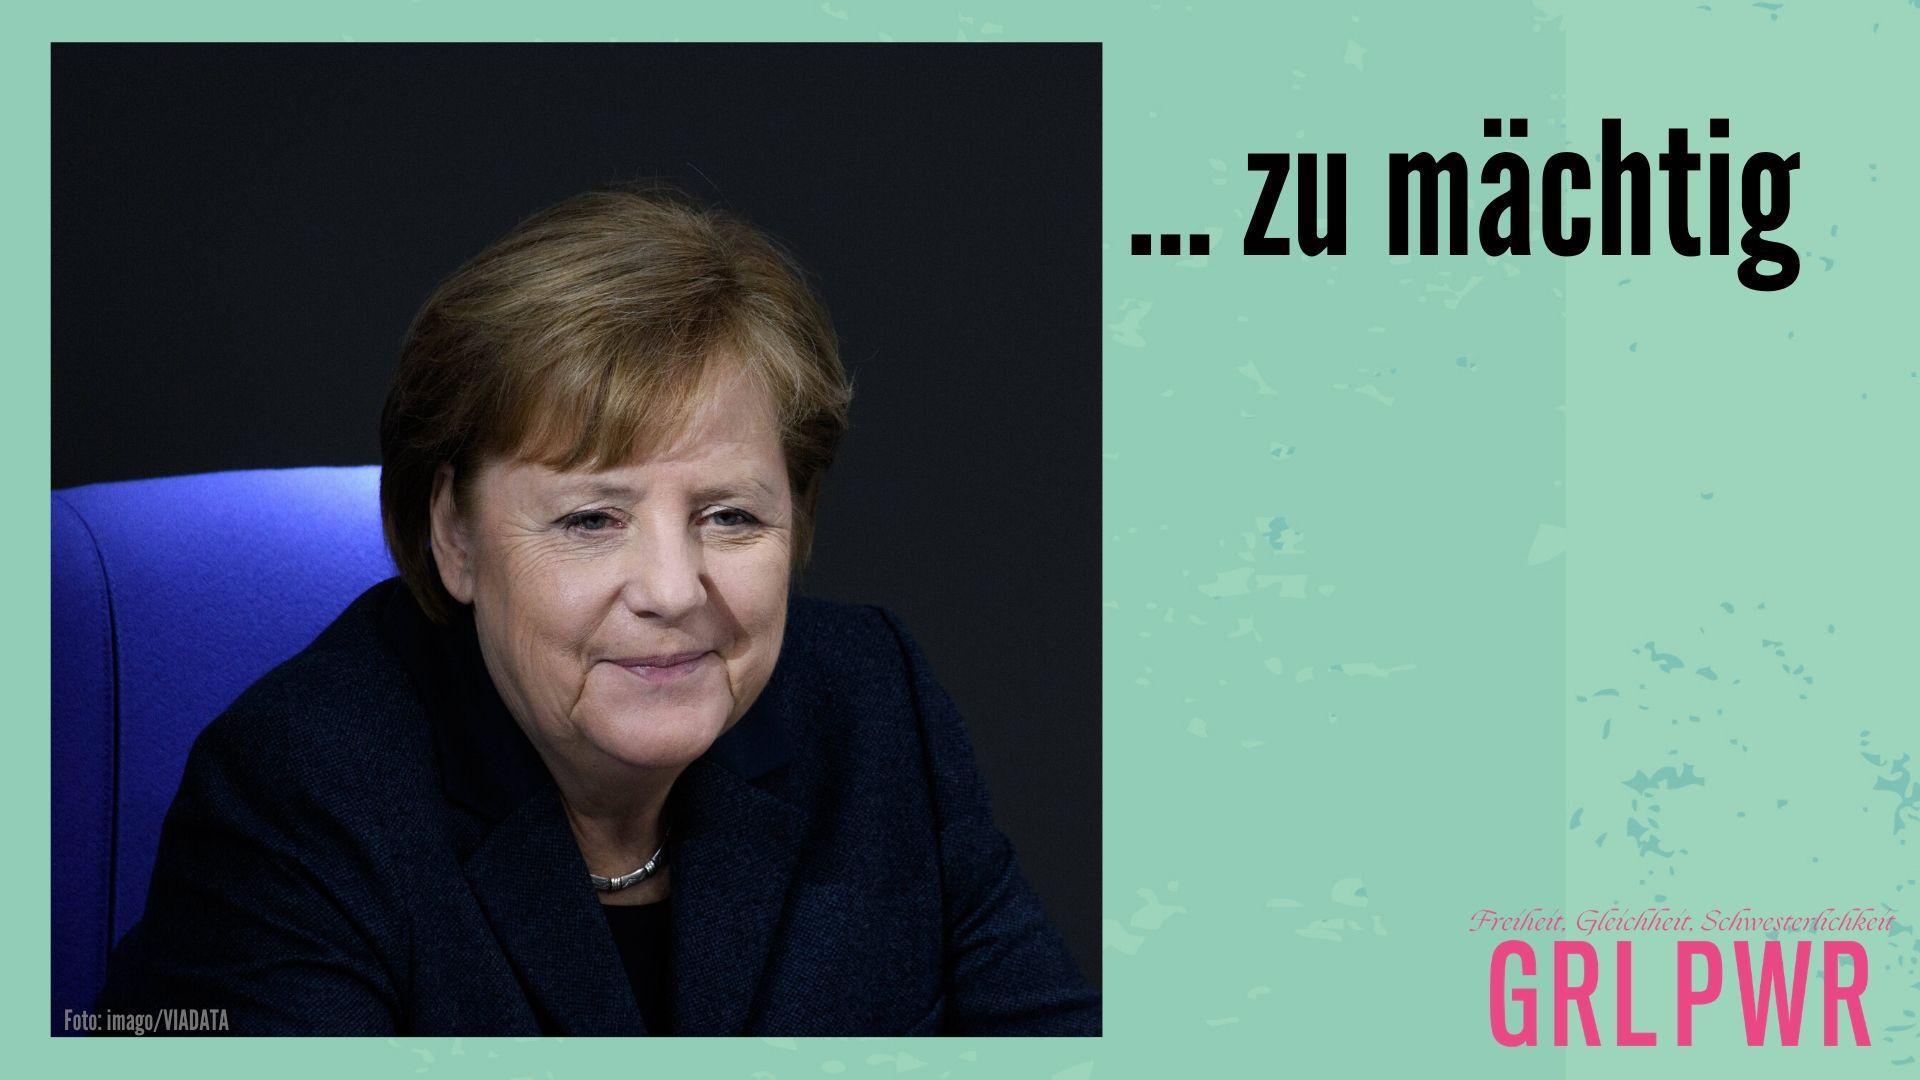 GRL PWR: Angela Merkel